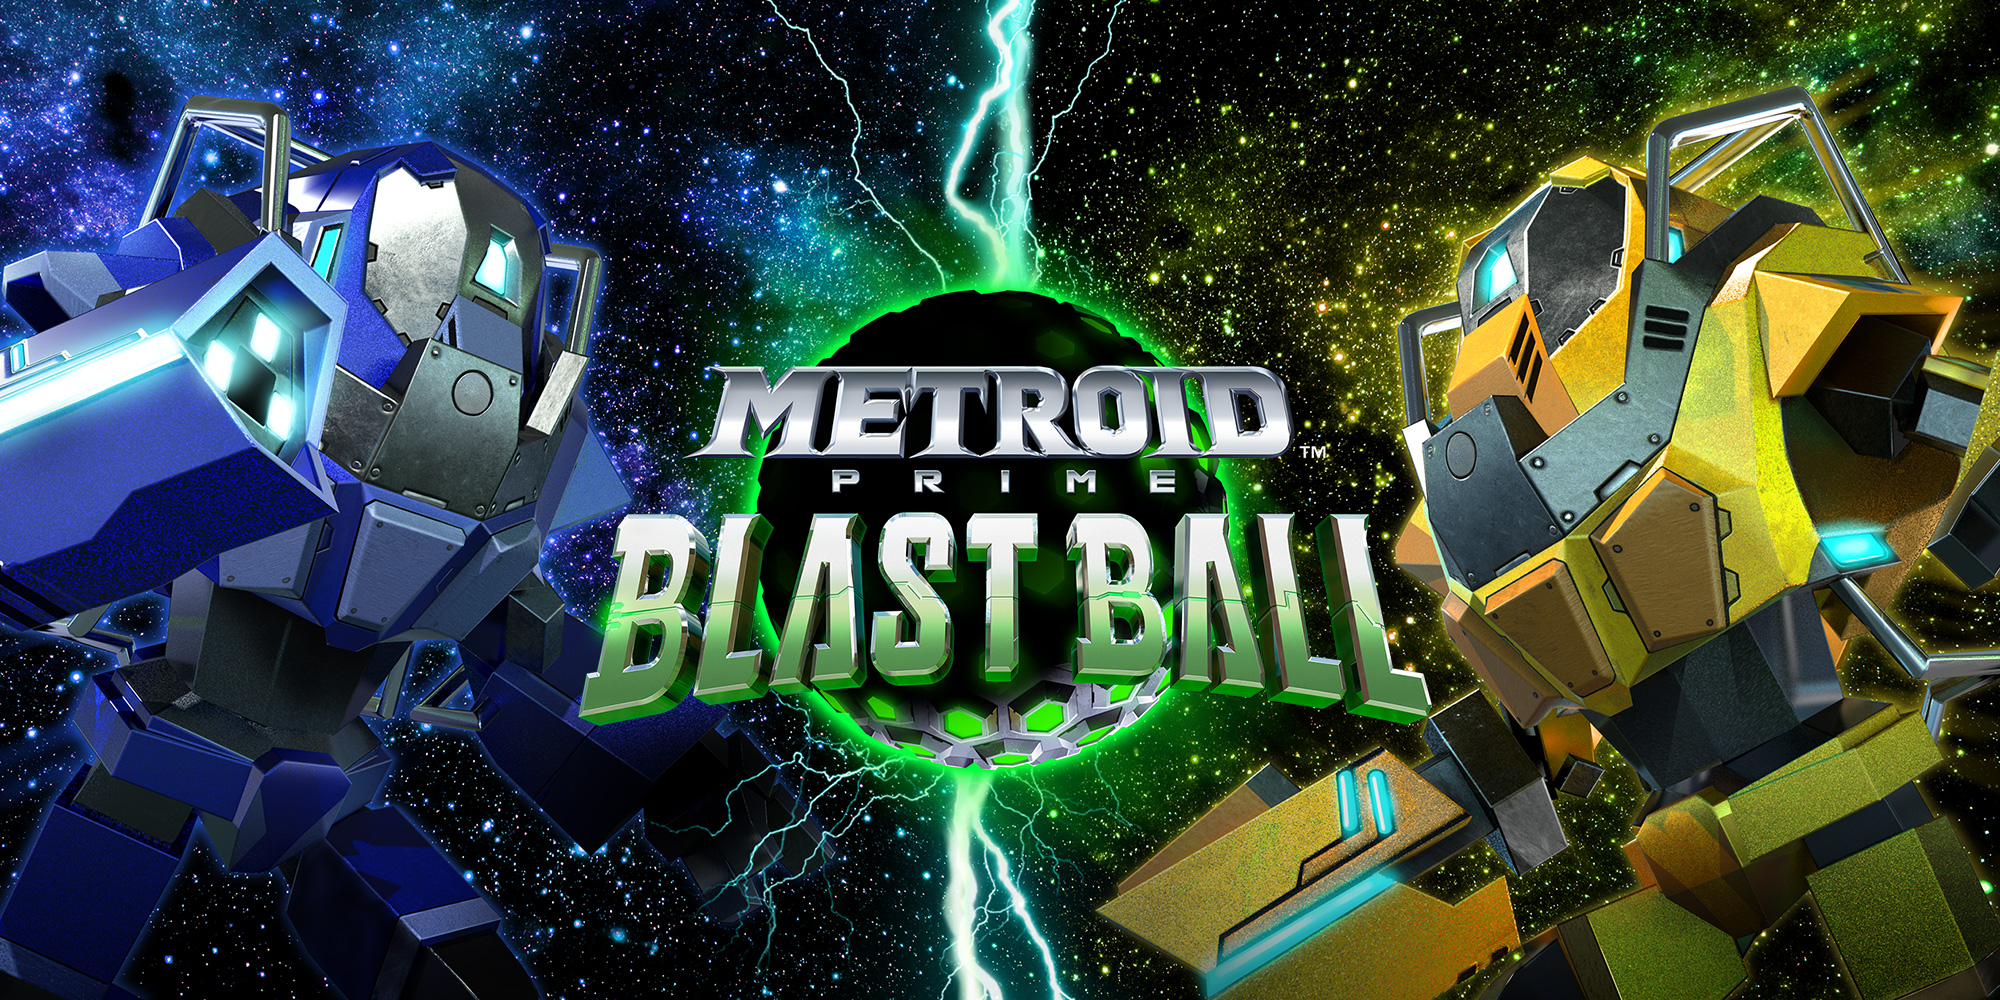 H2x1_3DSDS_MetroidPrimeBlastBall.jpg